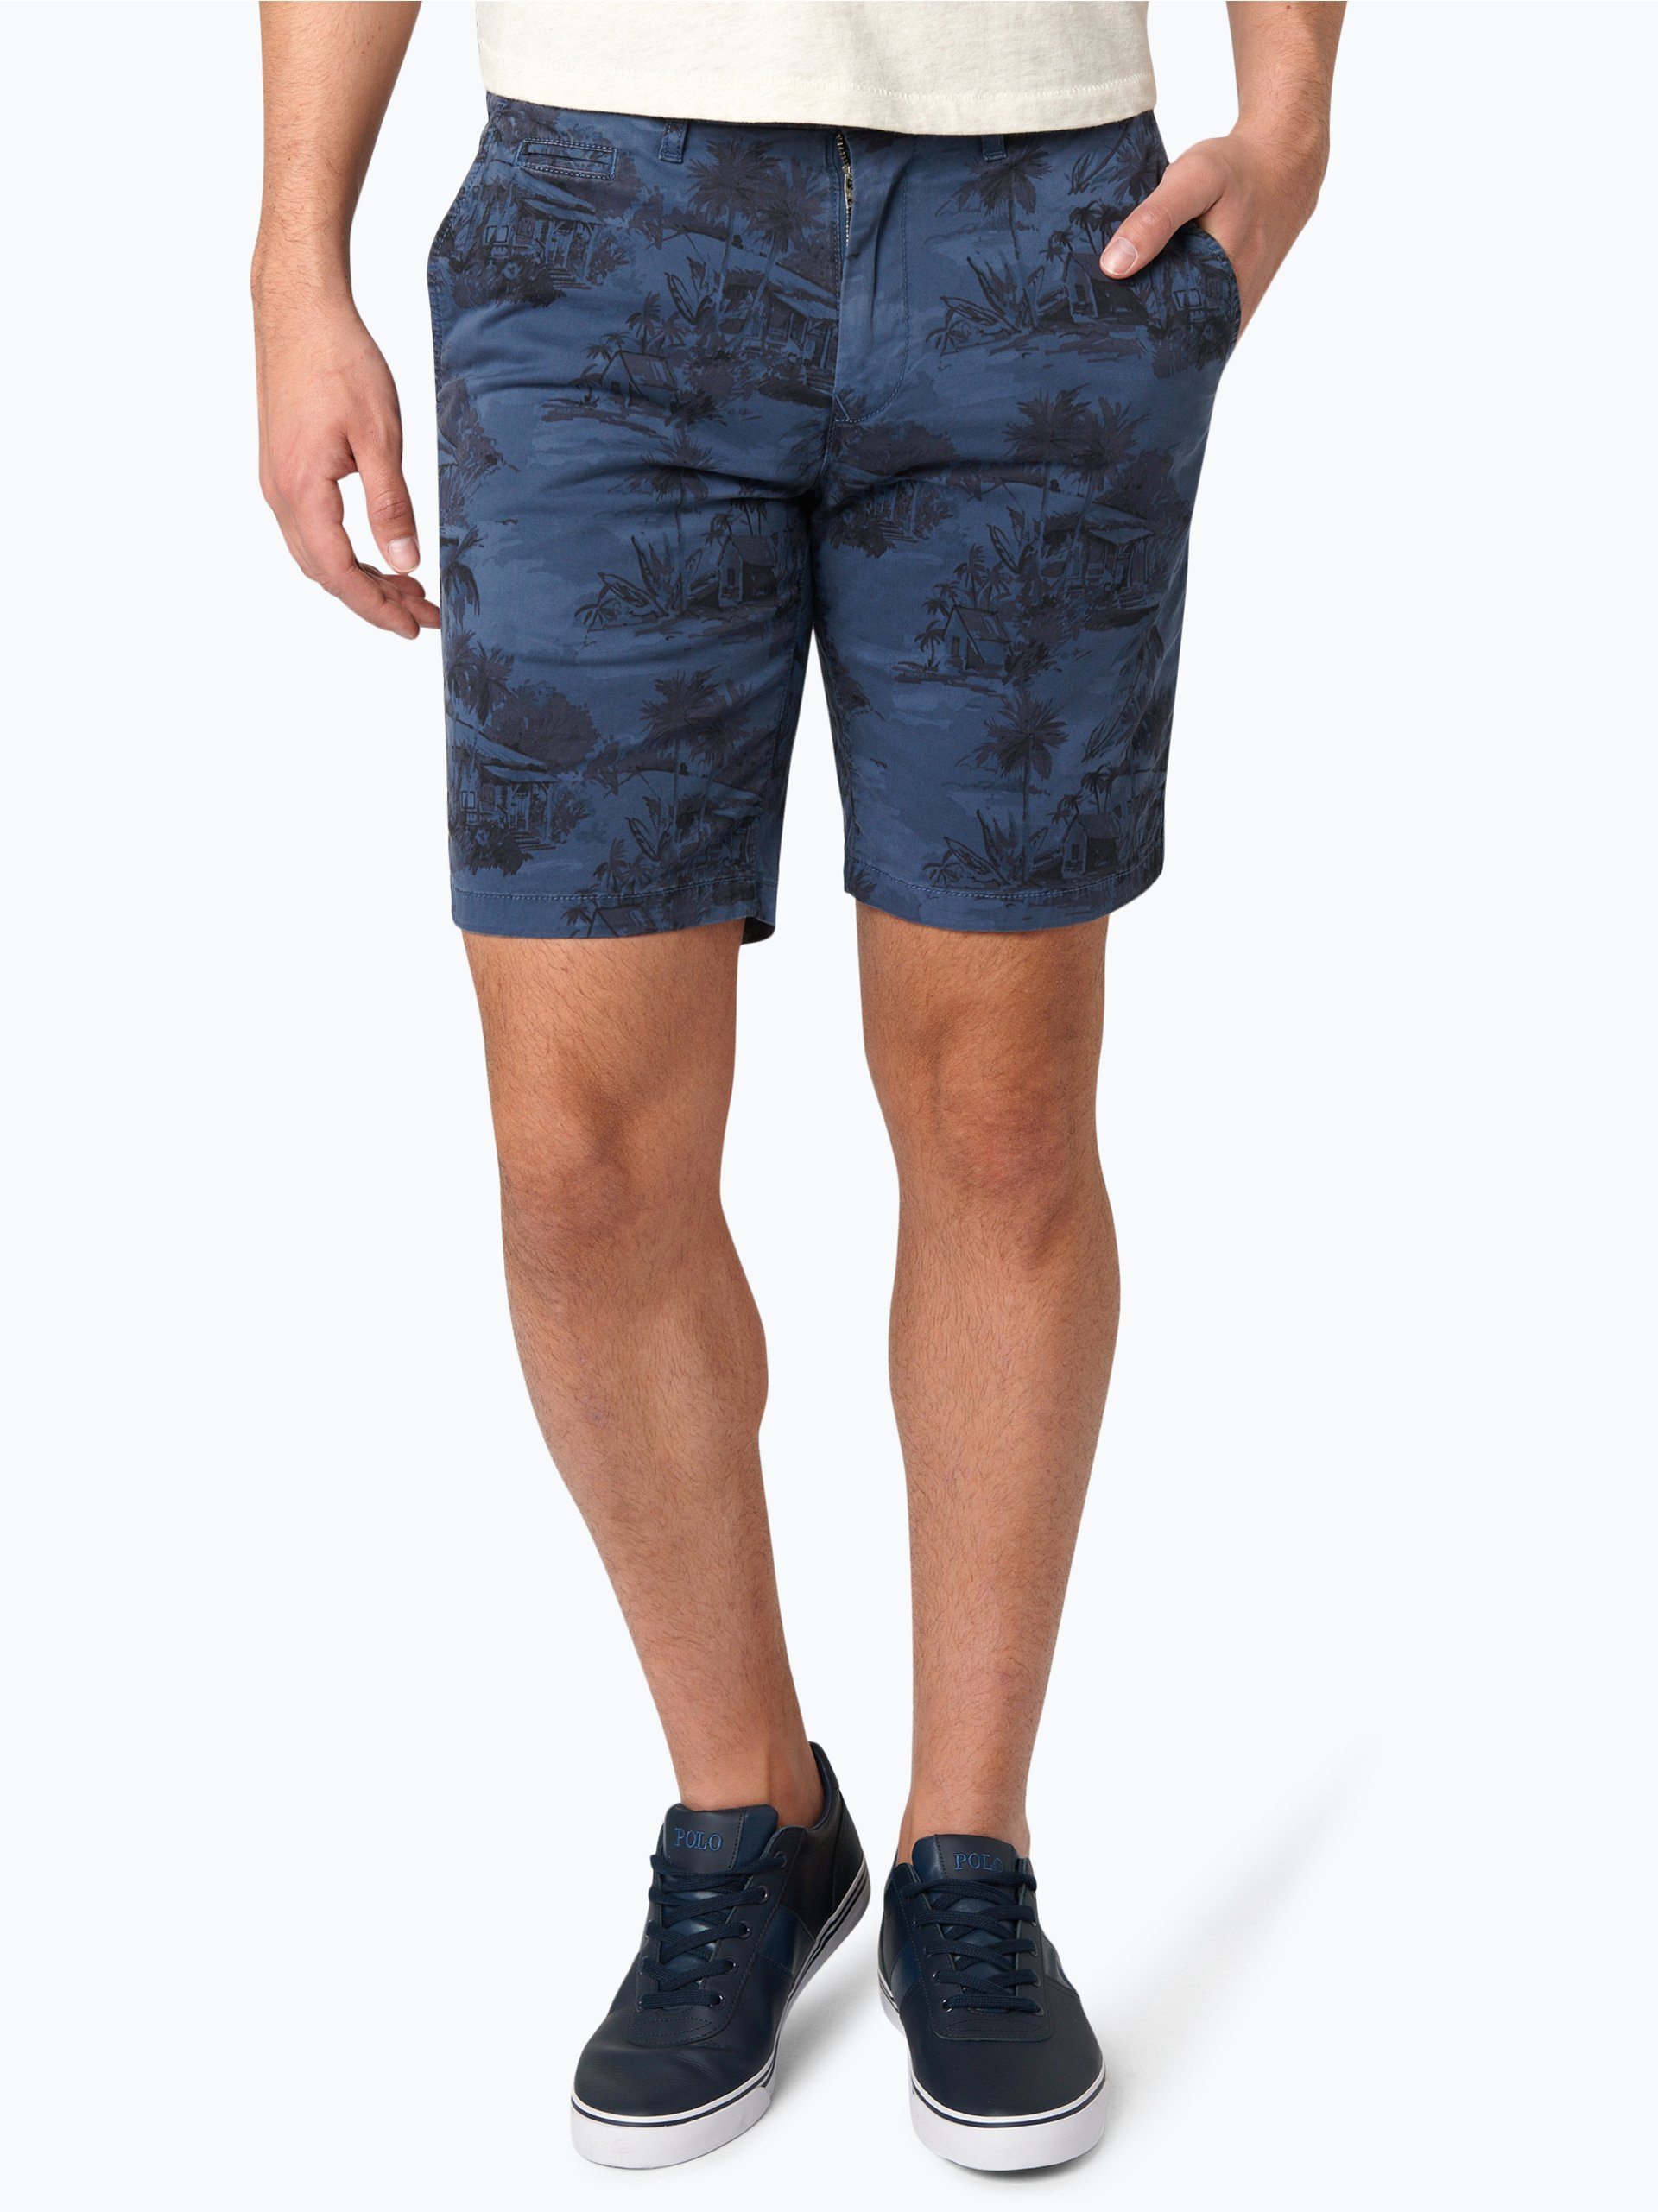 tommy hilfiger herren shorts denton blau gemustert online kaufen vangraaf com. Black Bedroom Furniture Sets. Home Design Ideas